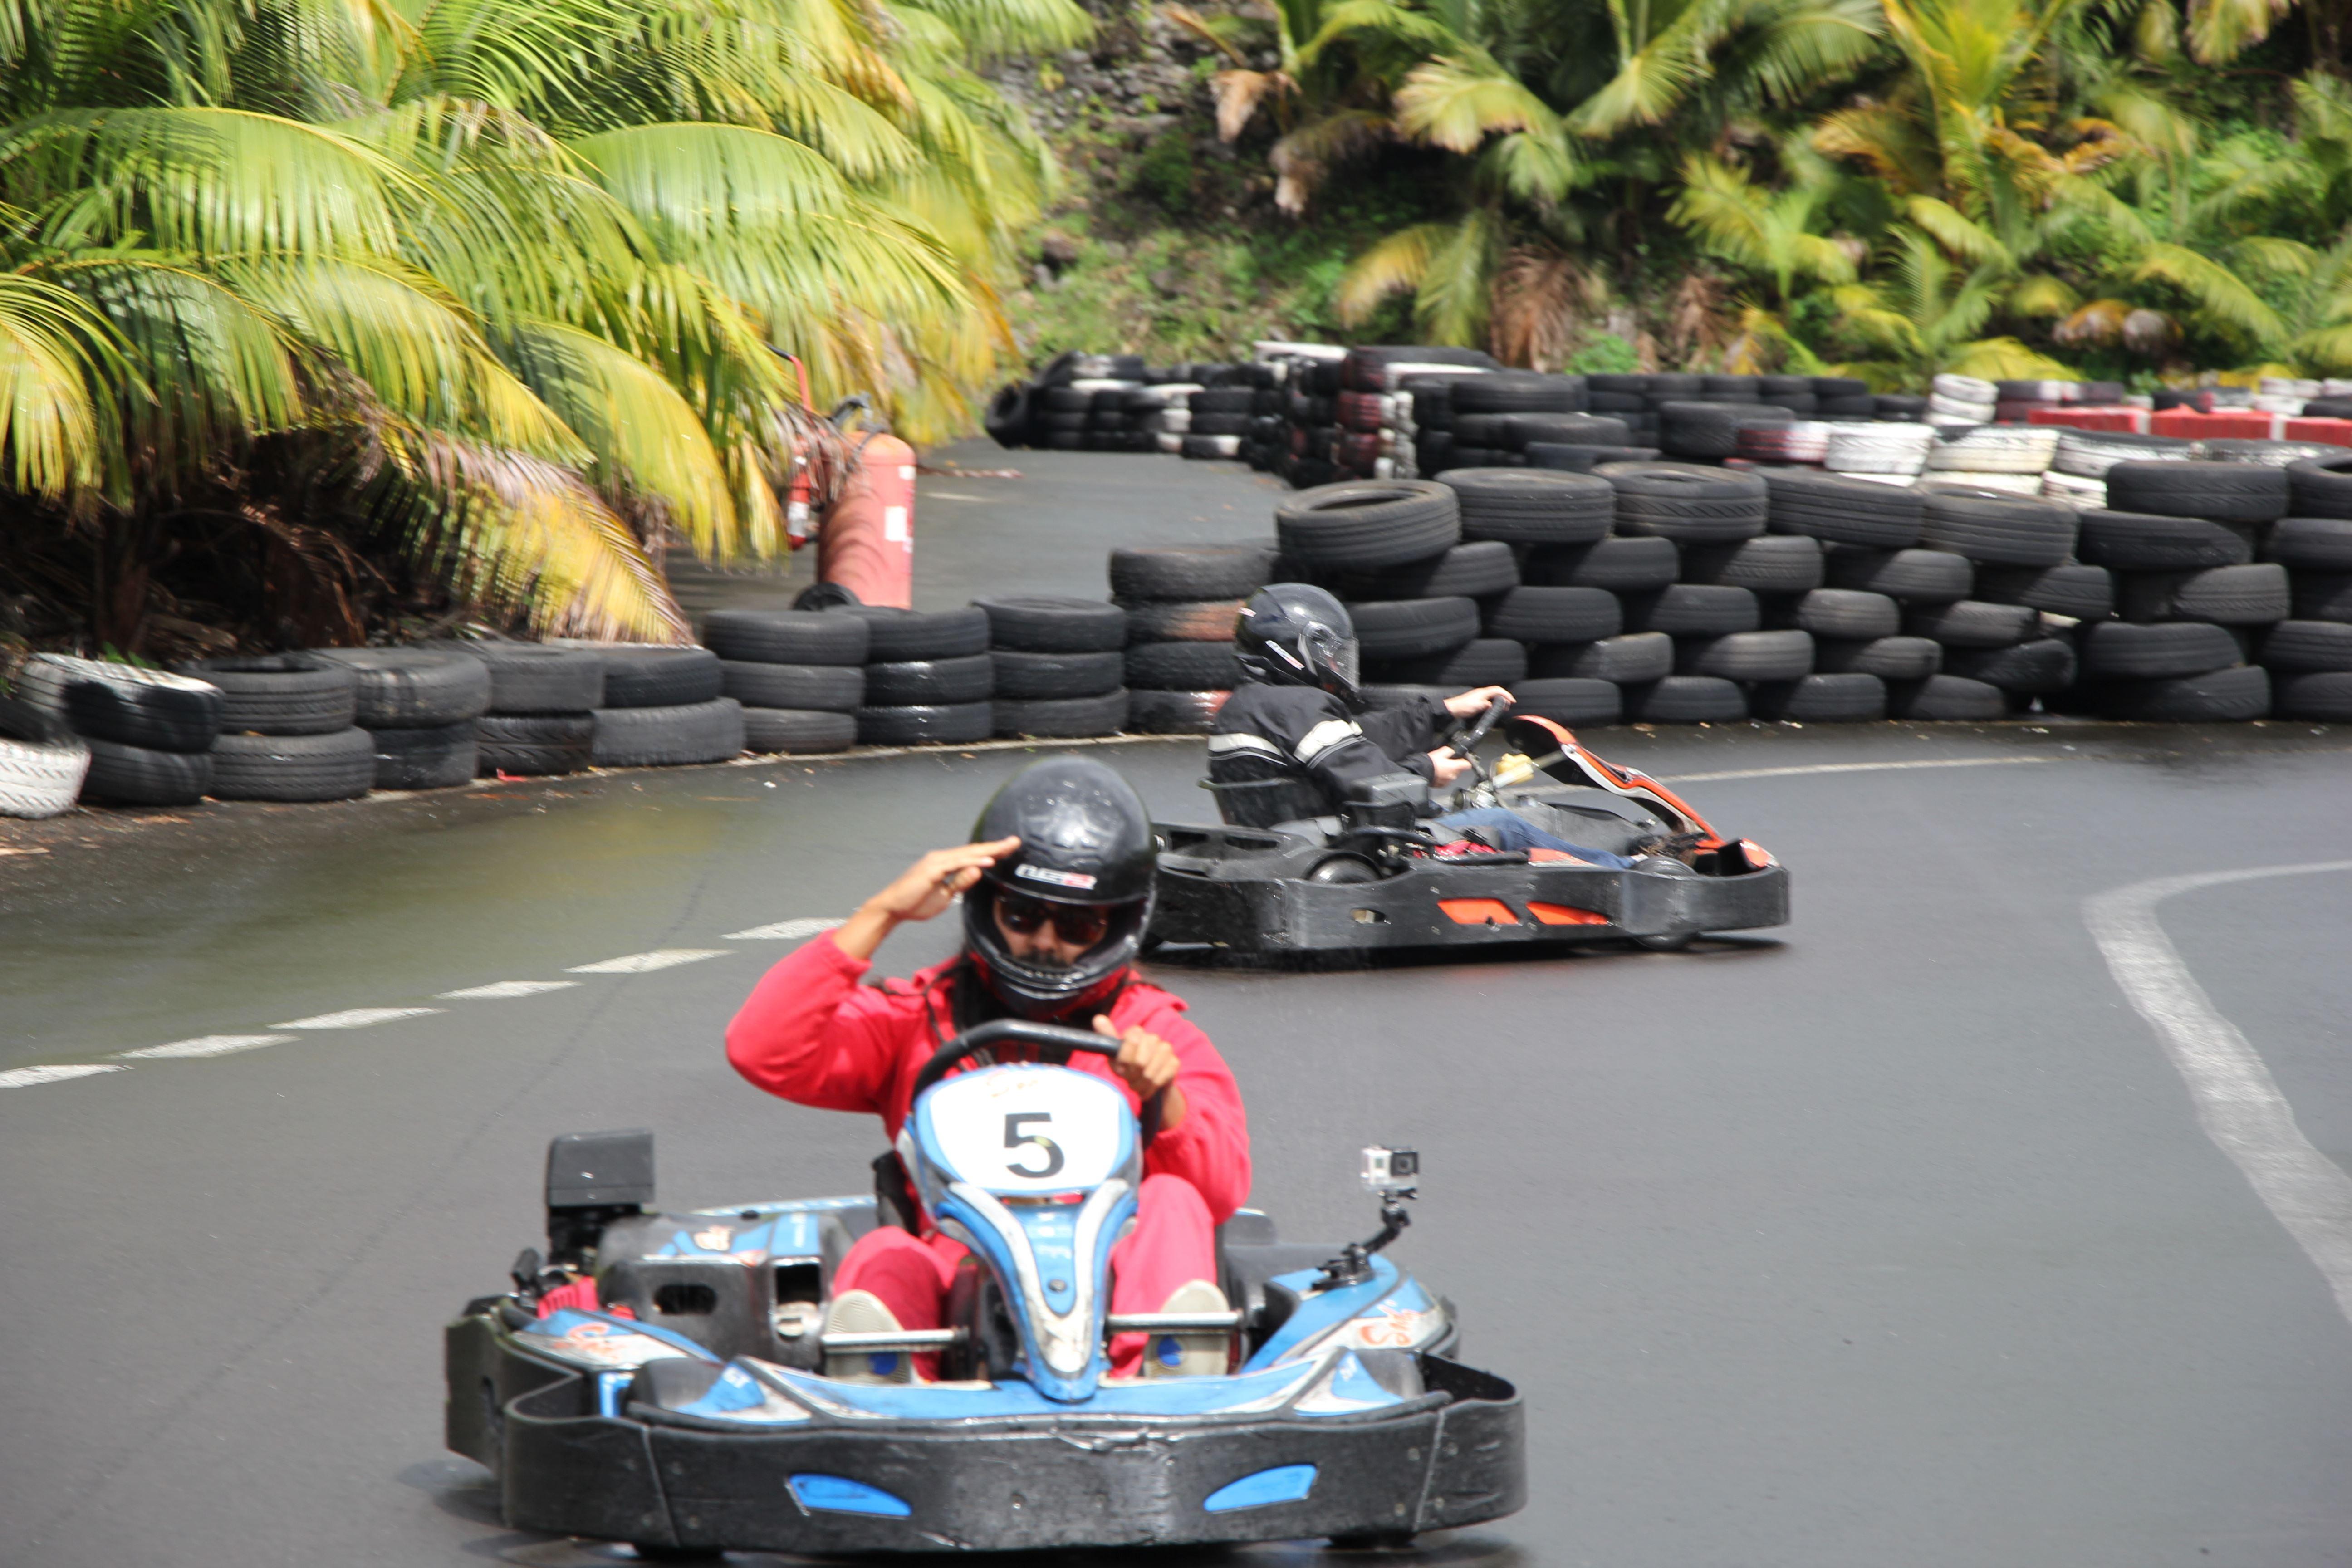 5,4,3,2,1... Go! Go-karting challenge